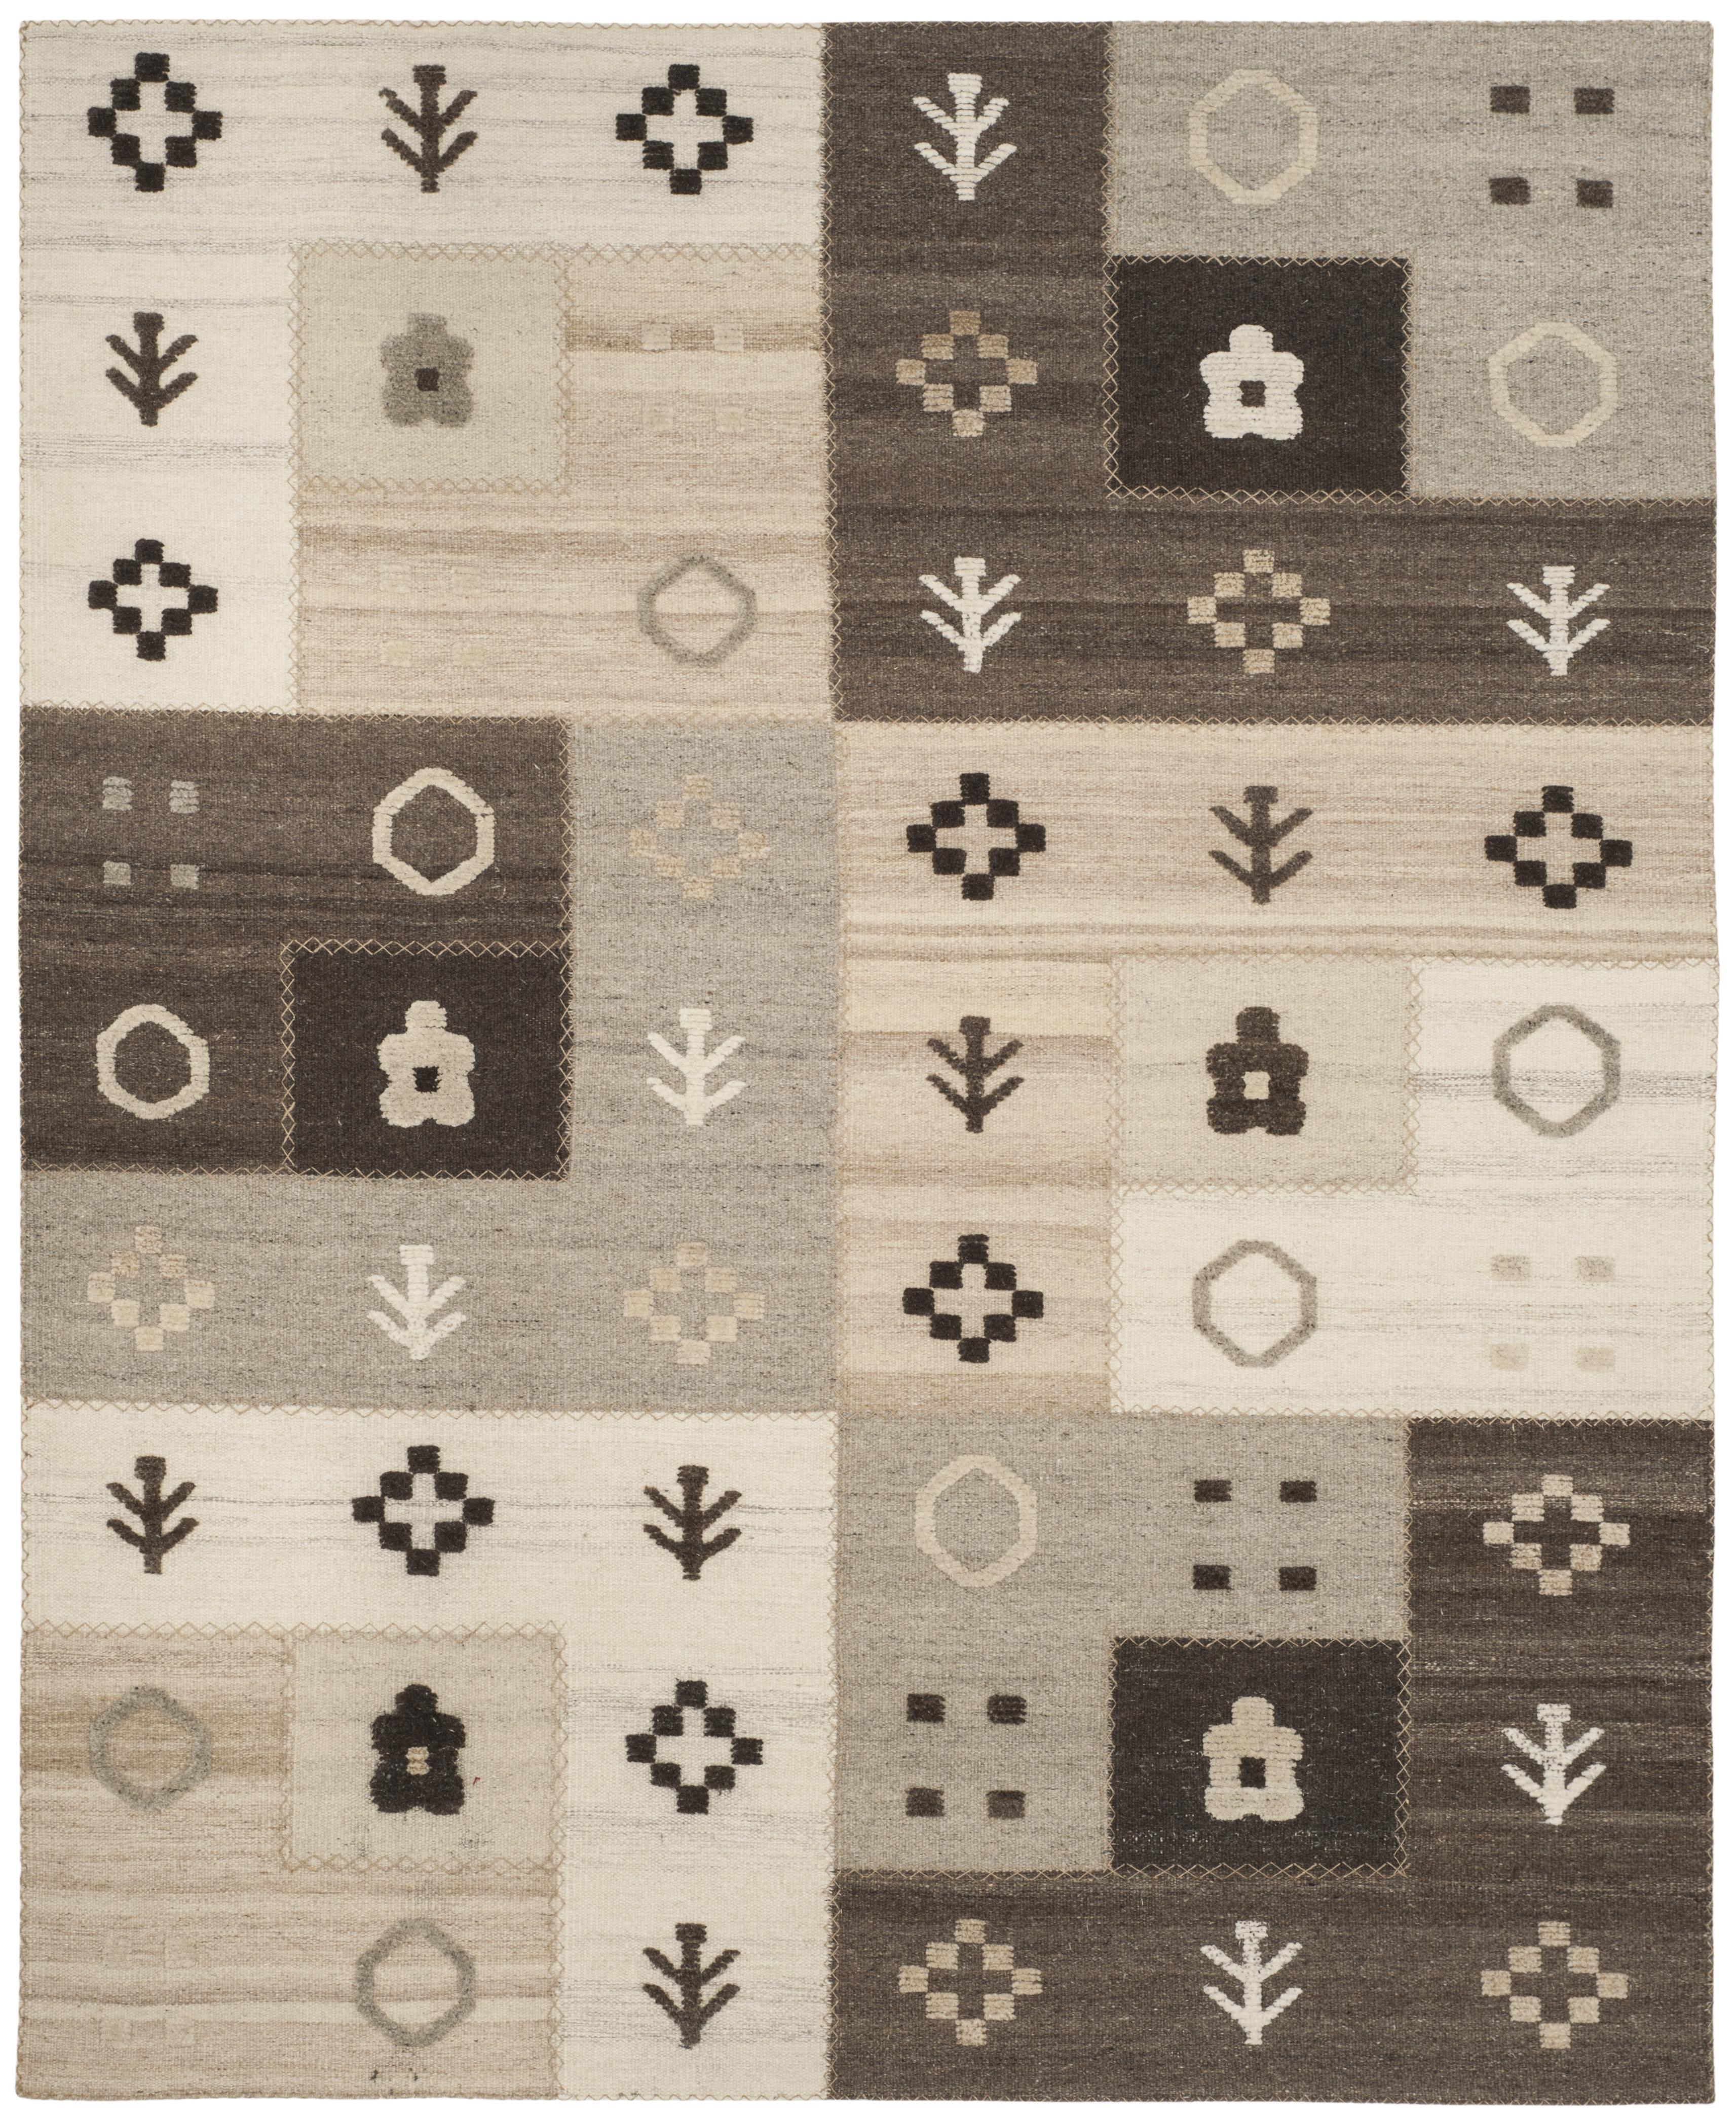 Gypsy 832 9' X 12' Natural Wool Rug